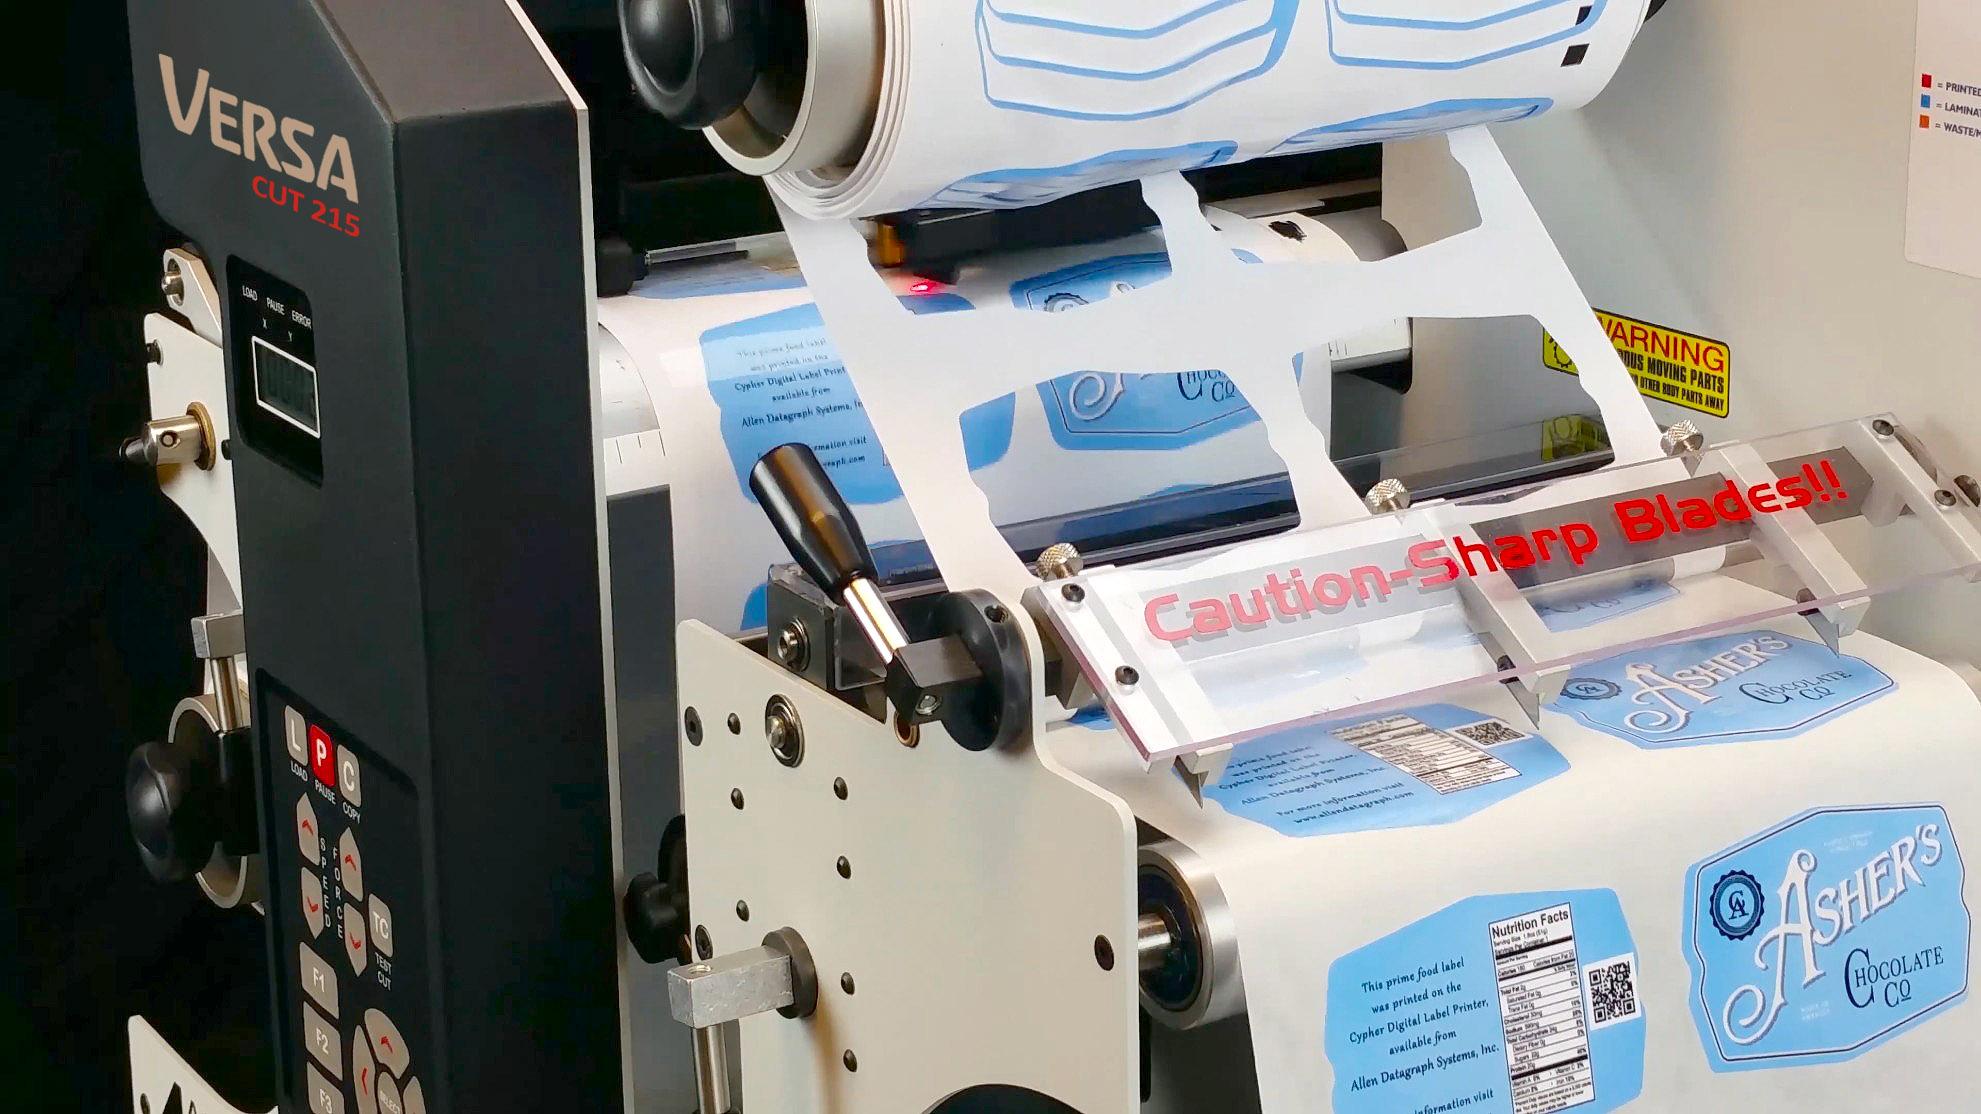 VersaCut 215 - Sistema de Acabamento Digital para Rótulos e Etiquetas Autoadesivas - Corte Longitudinal